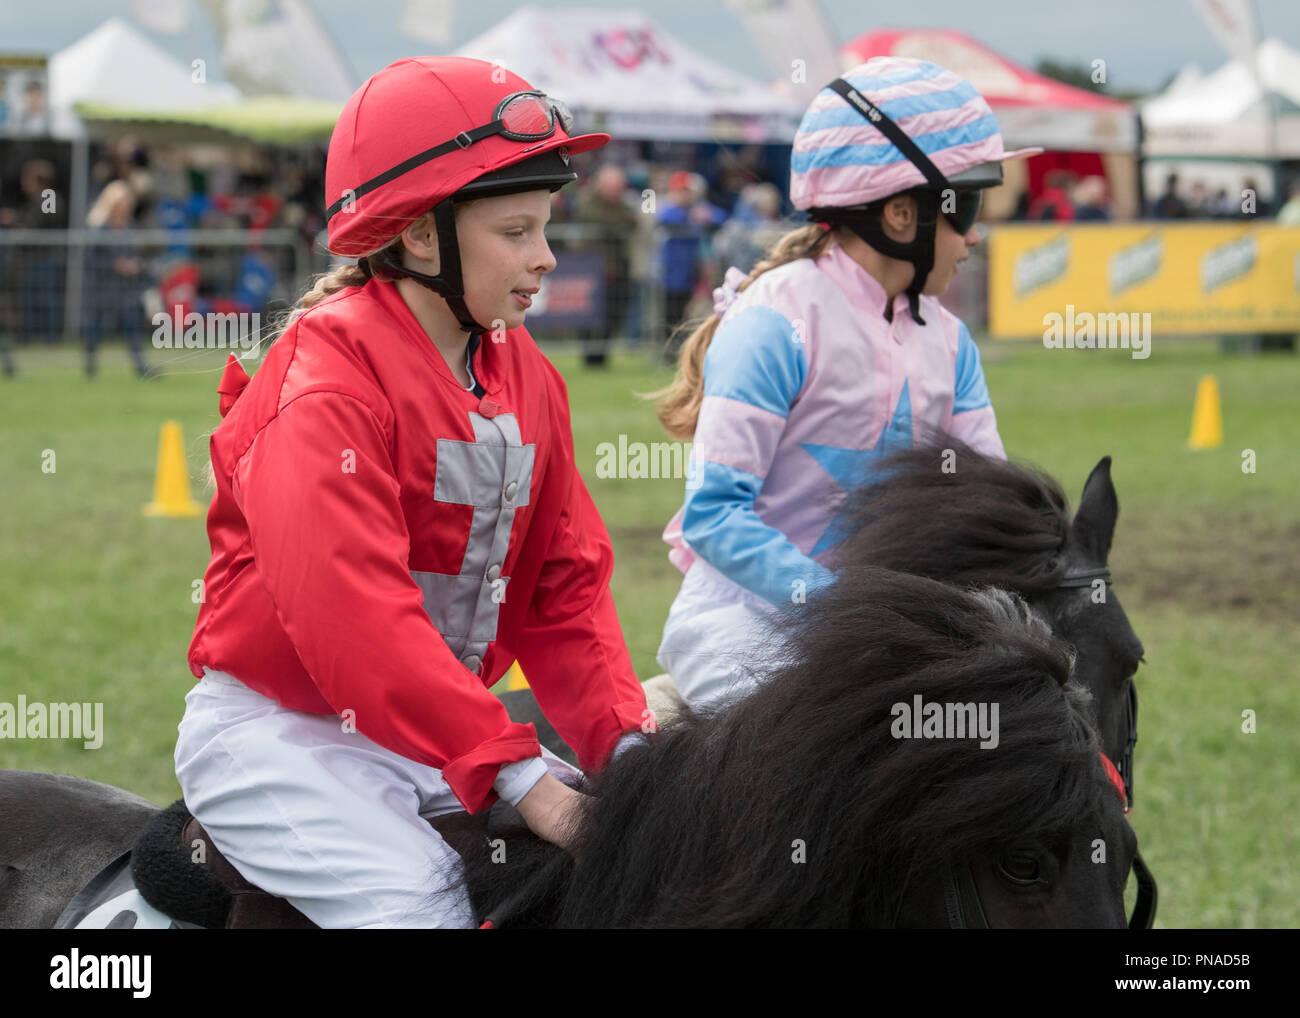 Cheshire Country Fair 2018 - Shetland Pony Racing Stock Photo